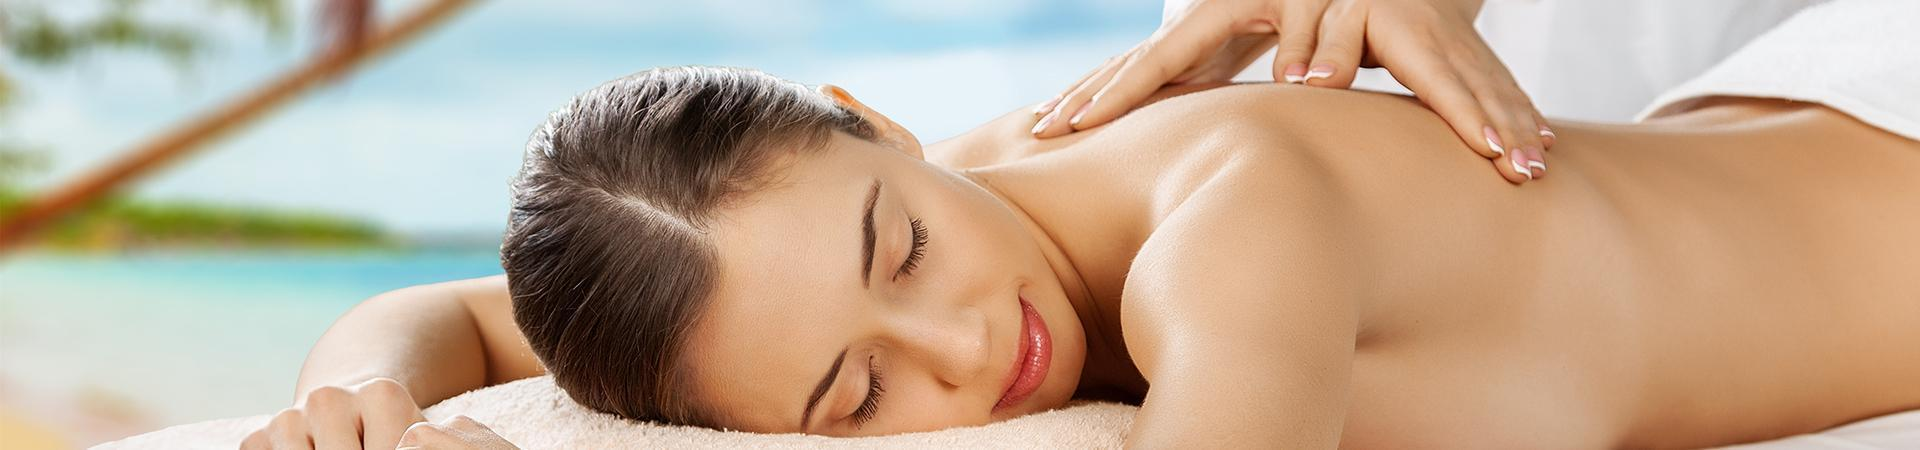 Massage Maastricht bij Massagepraktijk Alt